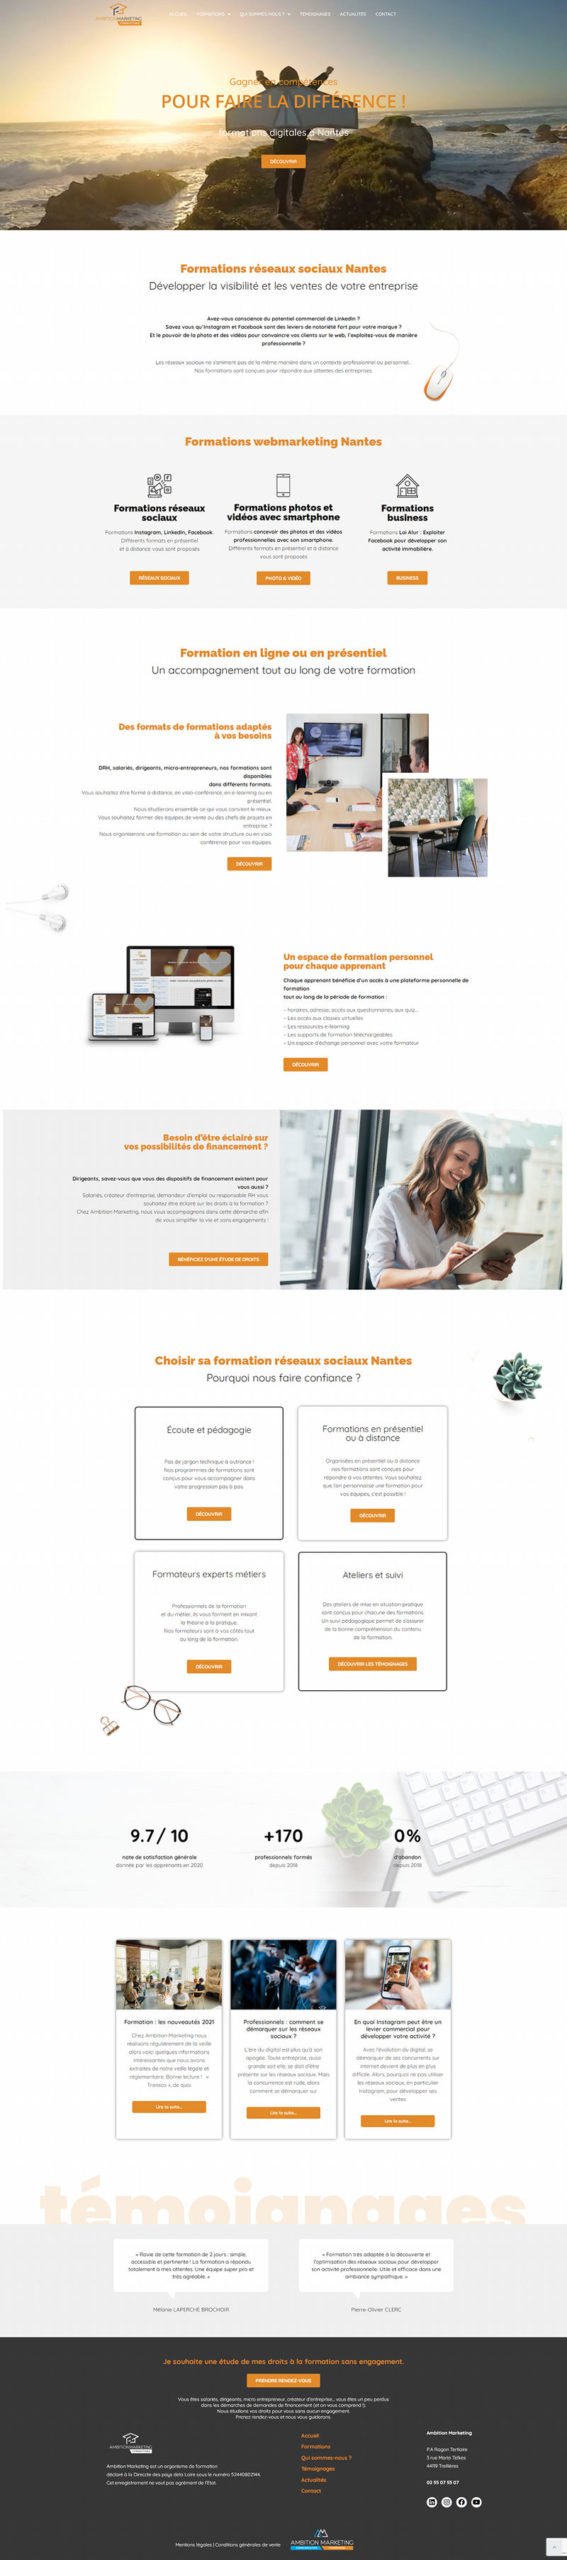 Formation création site internet Nantes